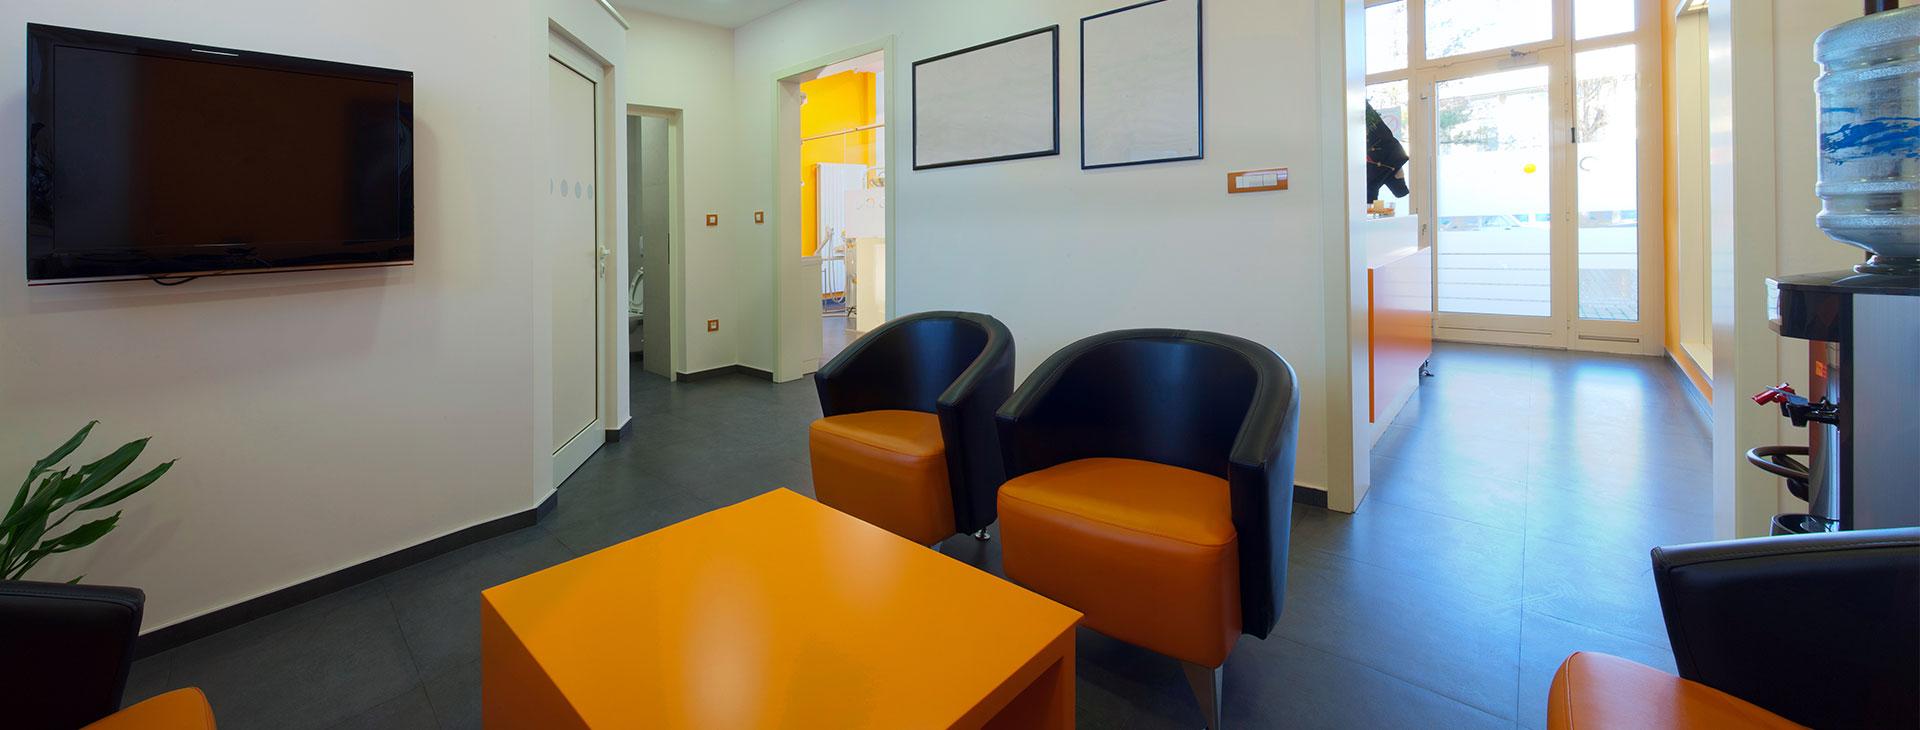 Waiting room at a dental clinic